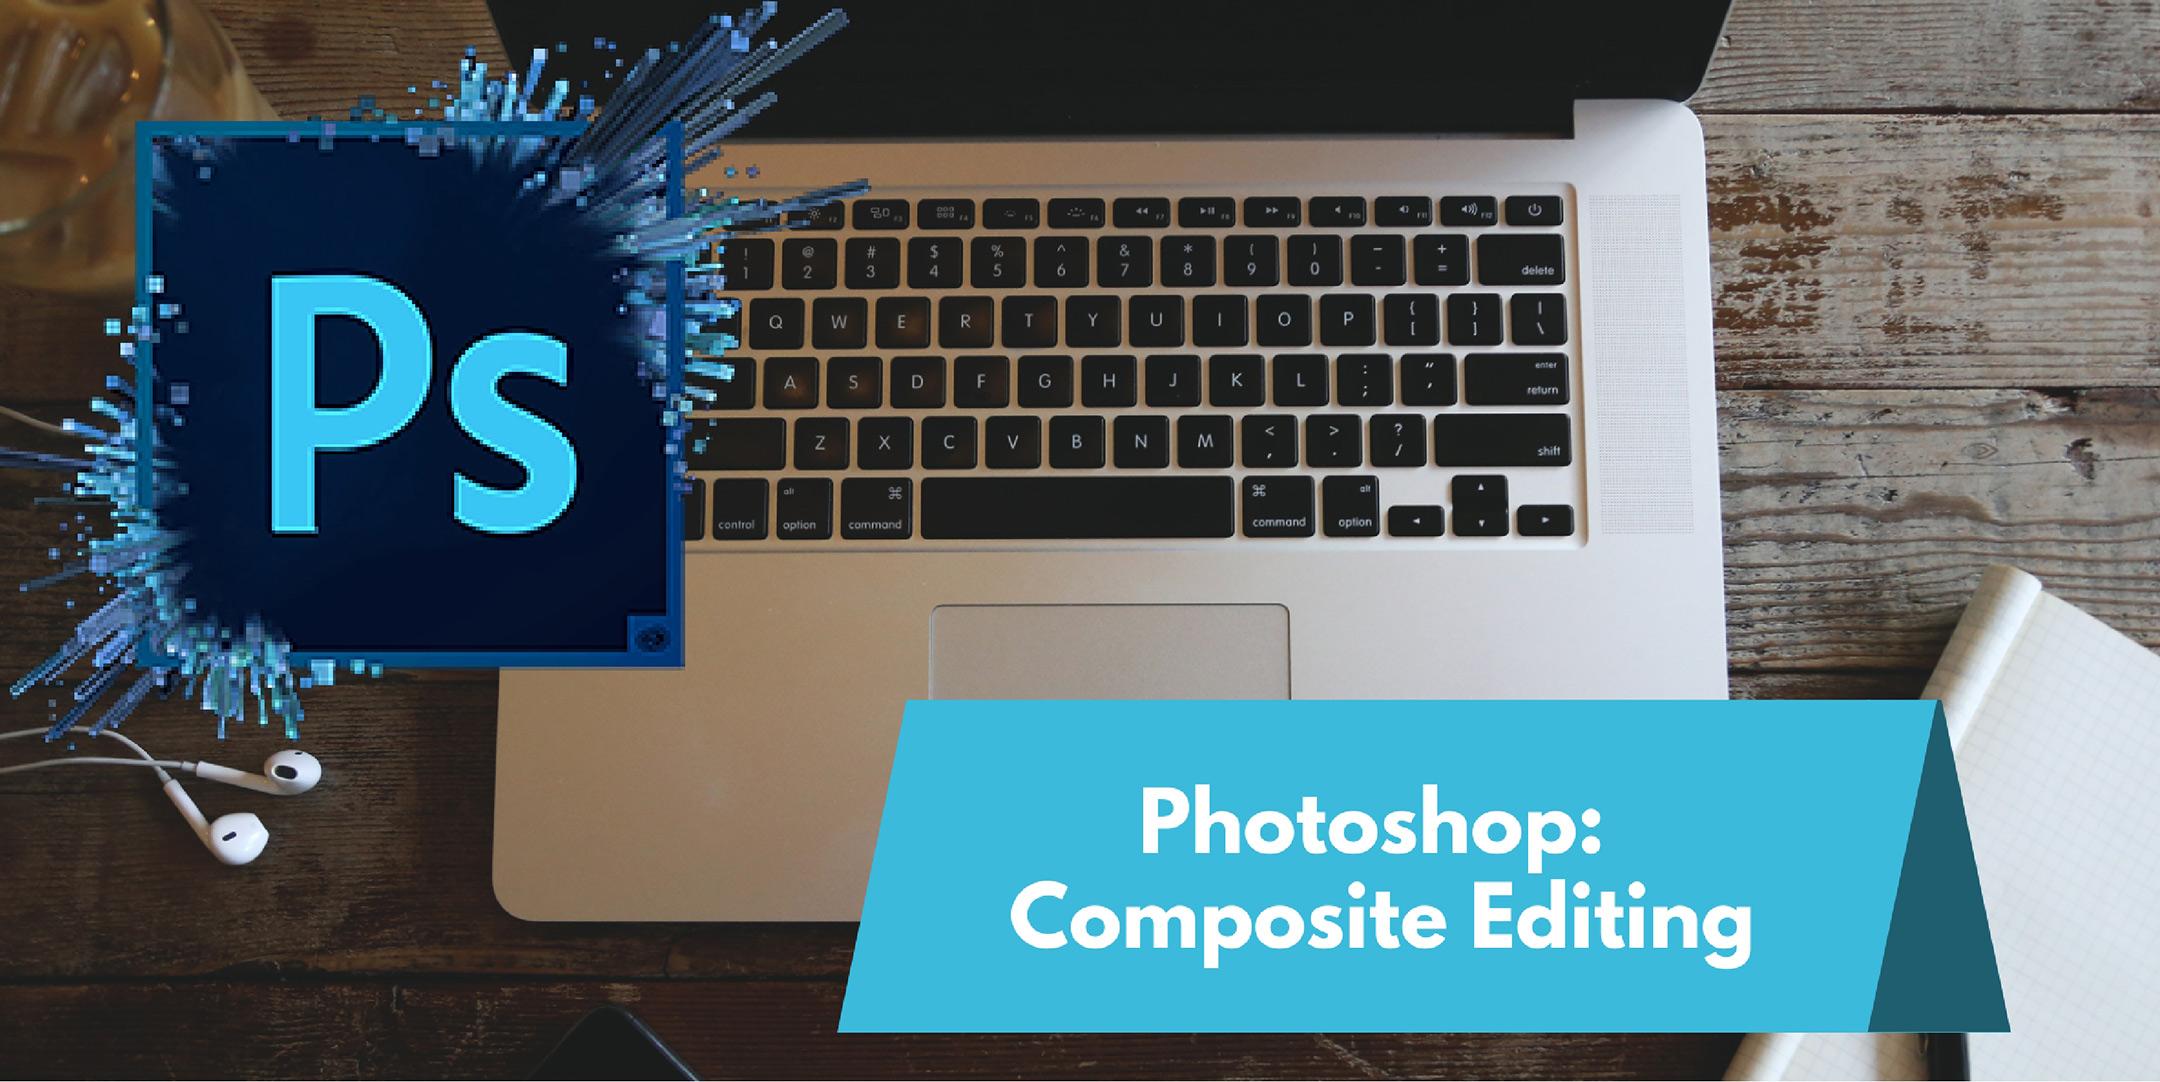 Photoshop Composite